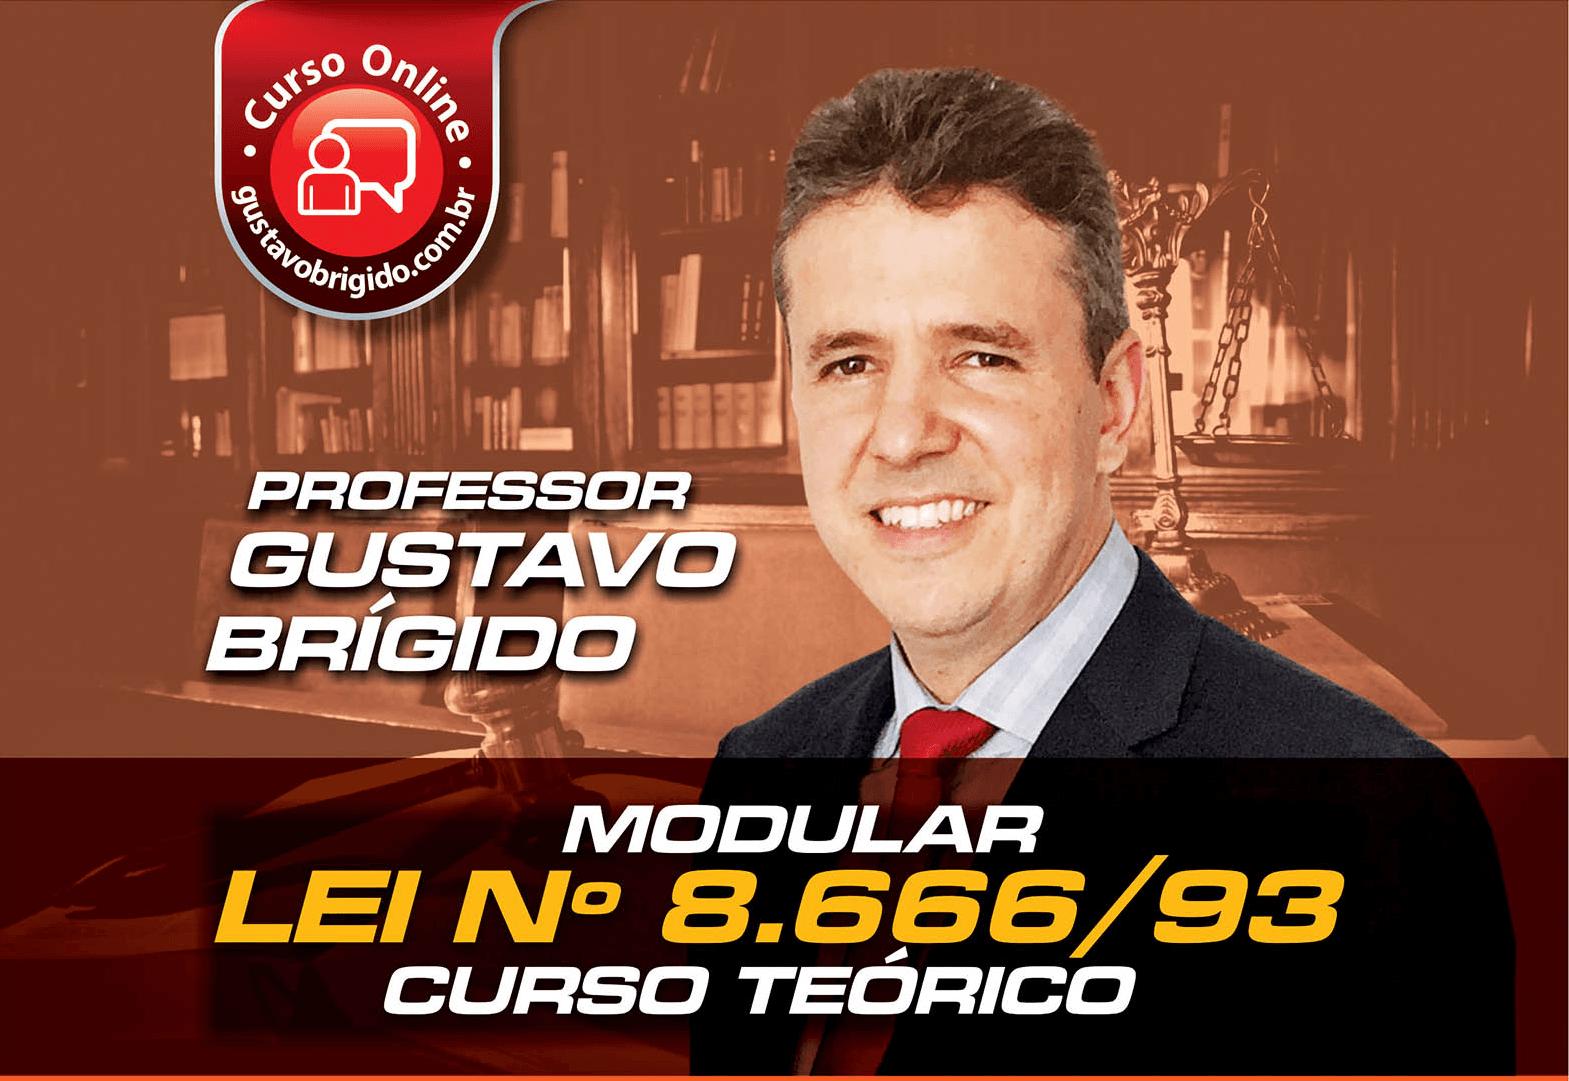 Lei 8.666/93 - Professor Gustavo Brígido